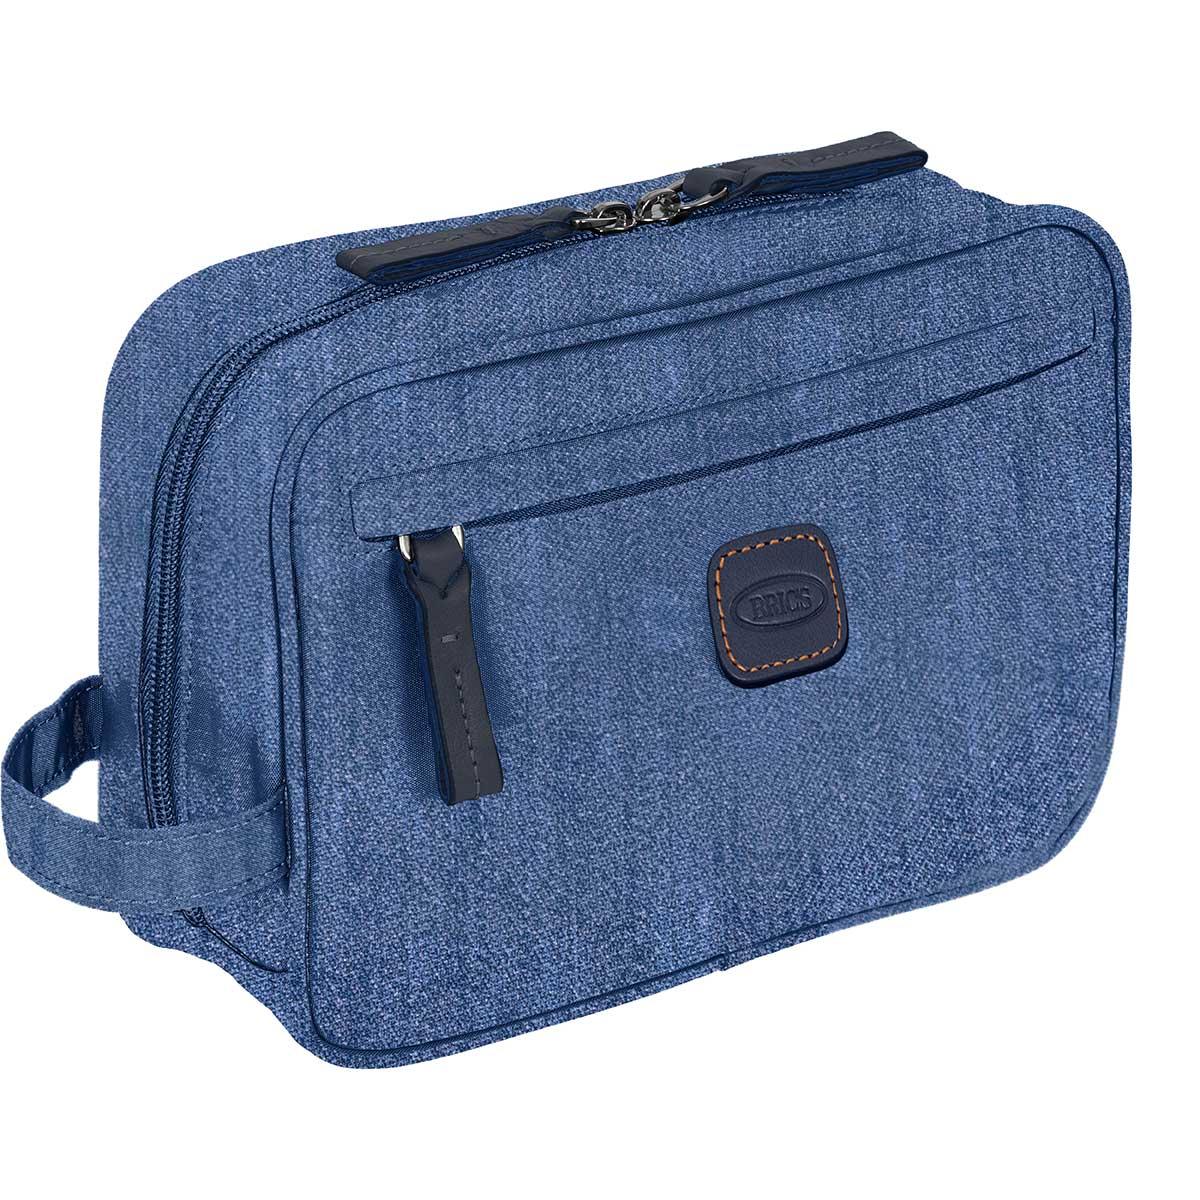 X-Bag Urban Travel Kit - Wisteria   BRIC'S Travel Bag